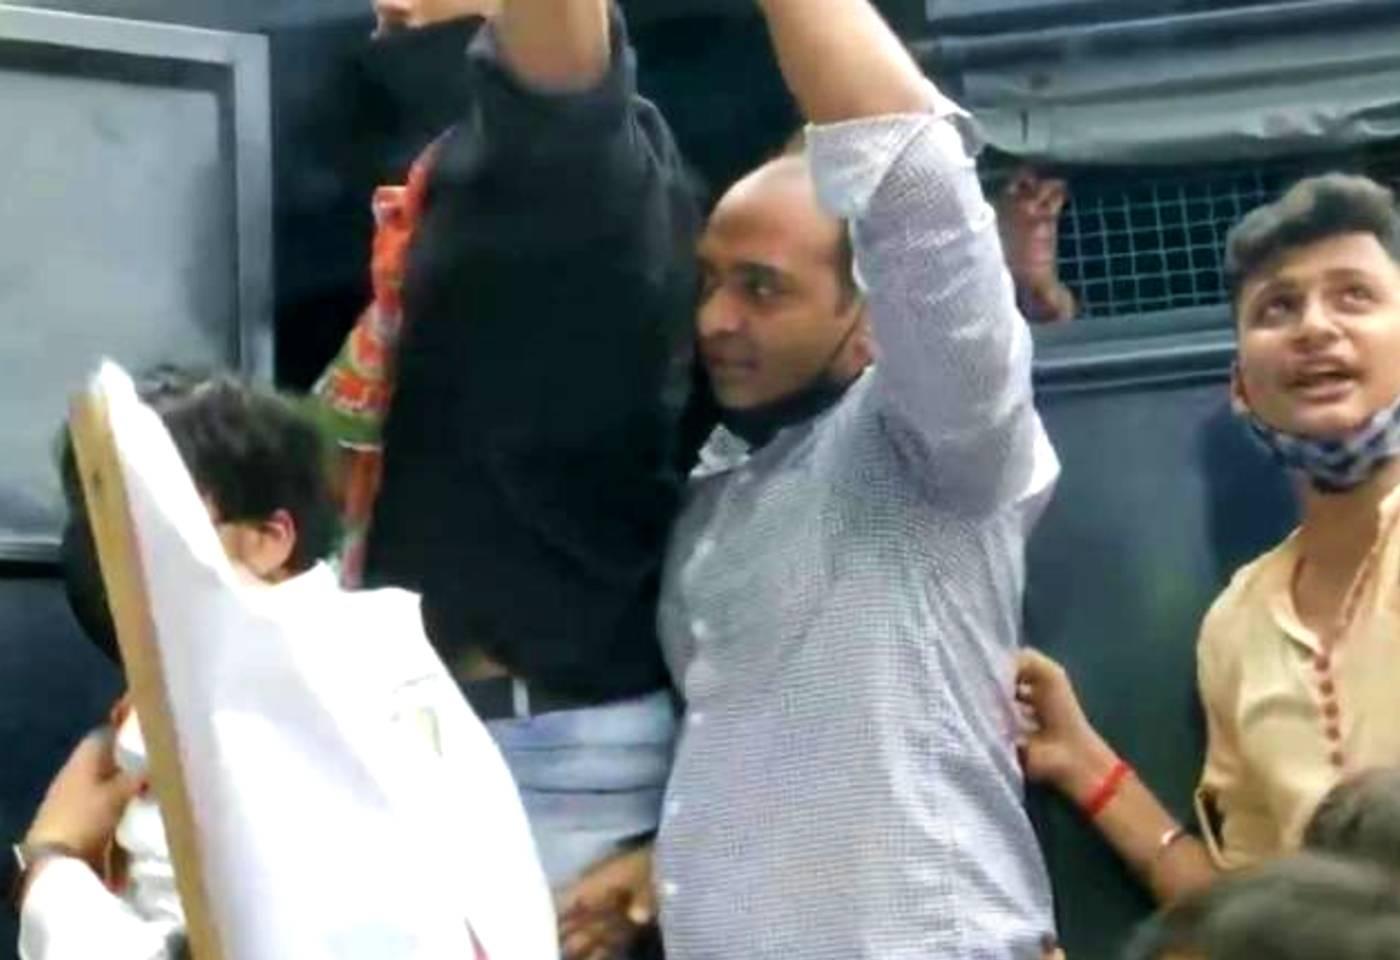 Bjp and shiv sena workers clash Near Shiv Sena Bhavan Dadar mumbai over Shri ram temple issue